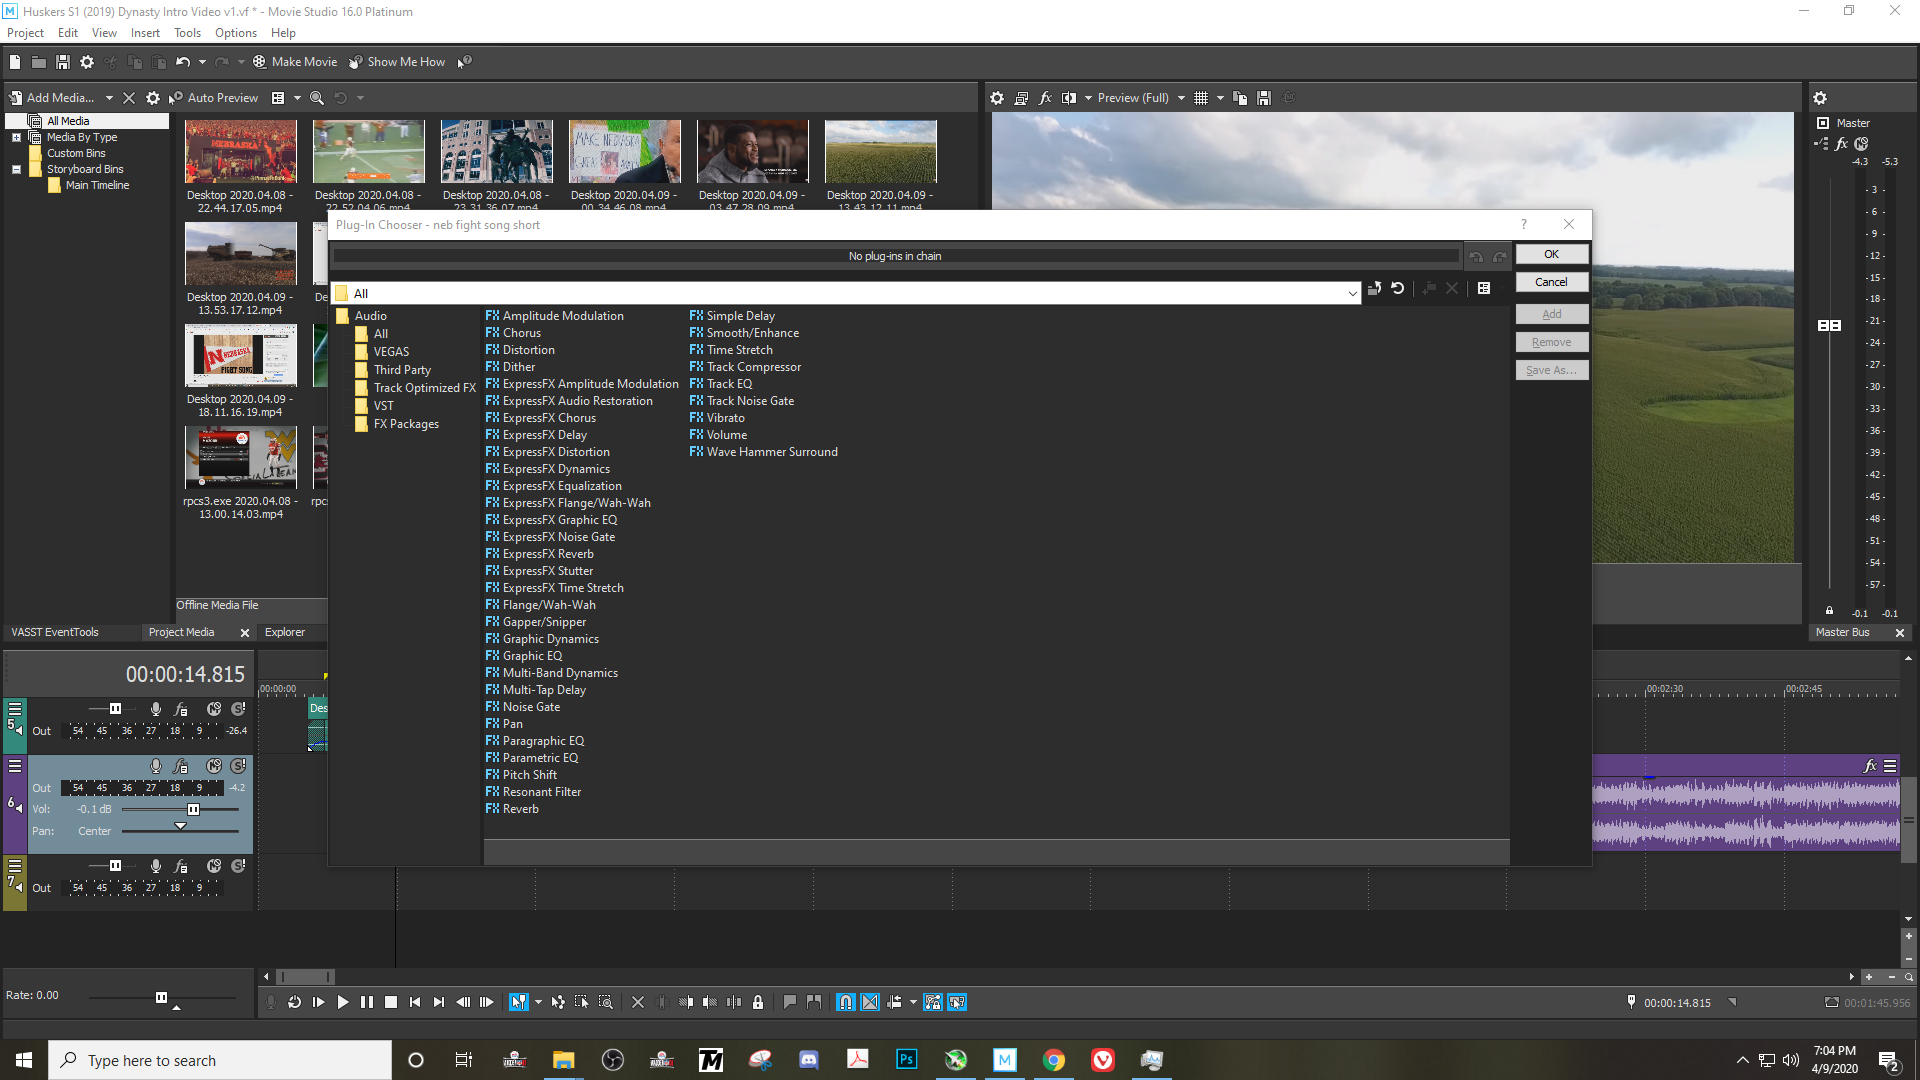 DesktopScreenshot2020.04.09-19.04.49.28.png